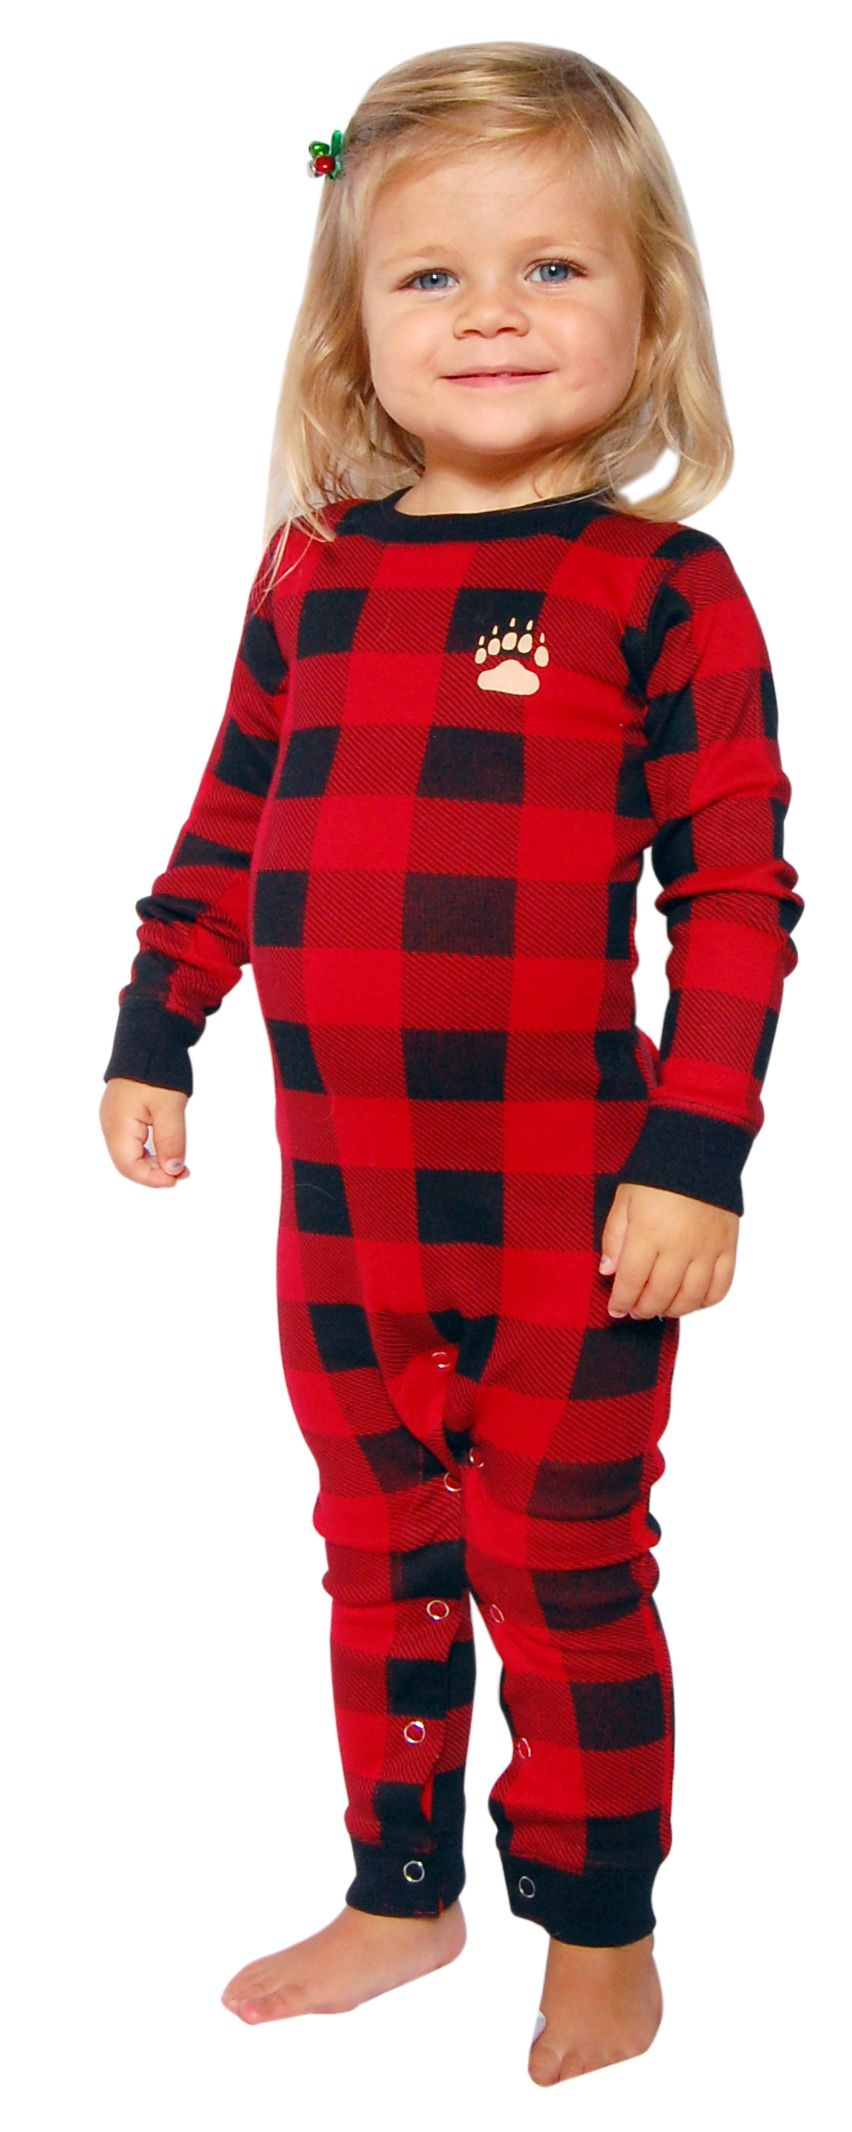 Matching Christmas pajamas LazyOne Bear Cheeks Flapjacks